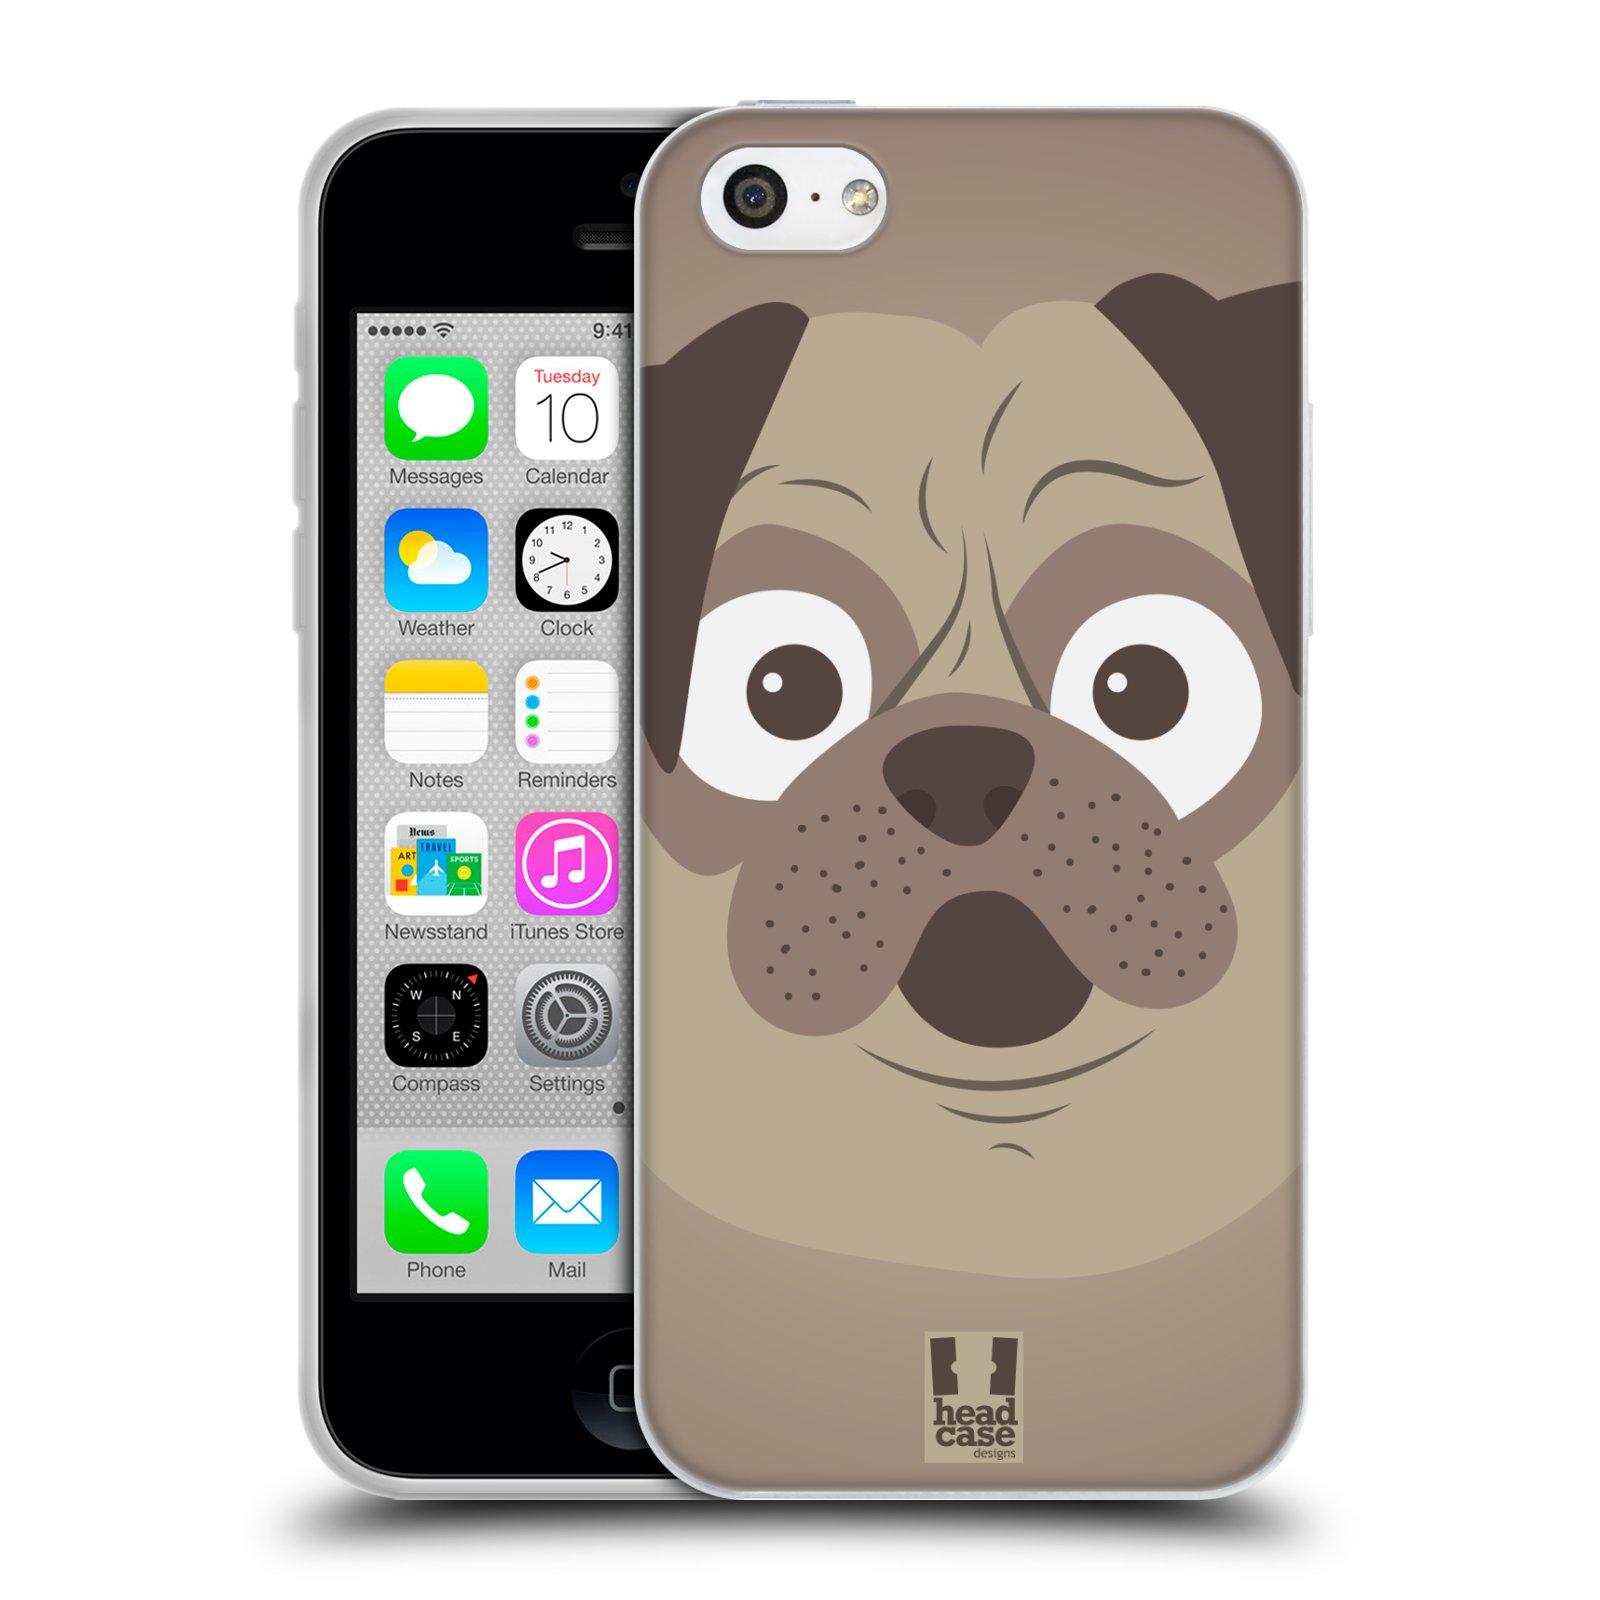 HEAD CASE silikonový obal na mobil Apple Iphone 5C vzor Cartoon Karikatura barevná kreslená zvířátka pes mopsík